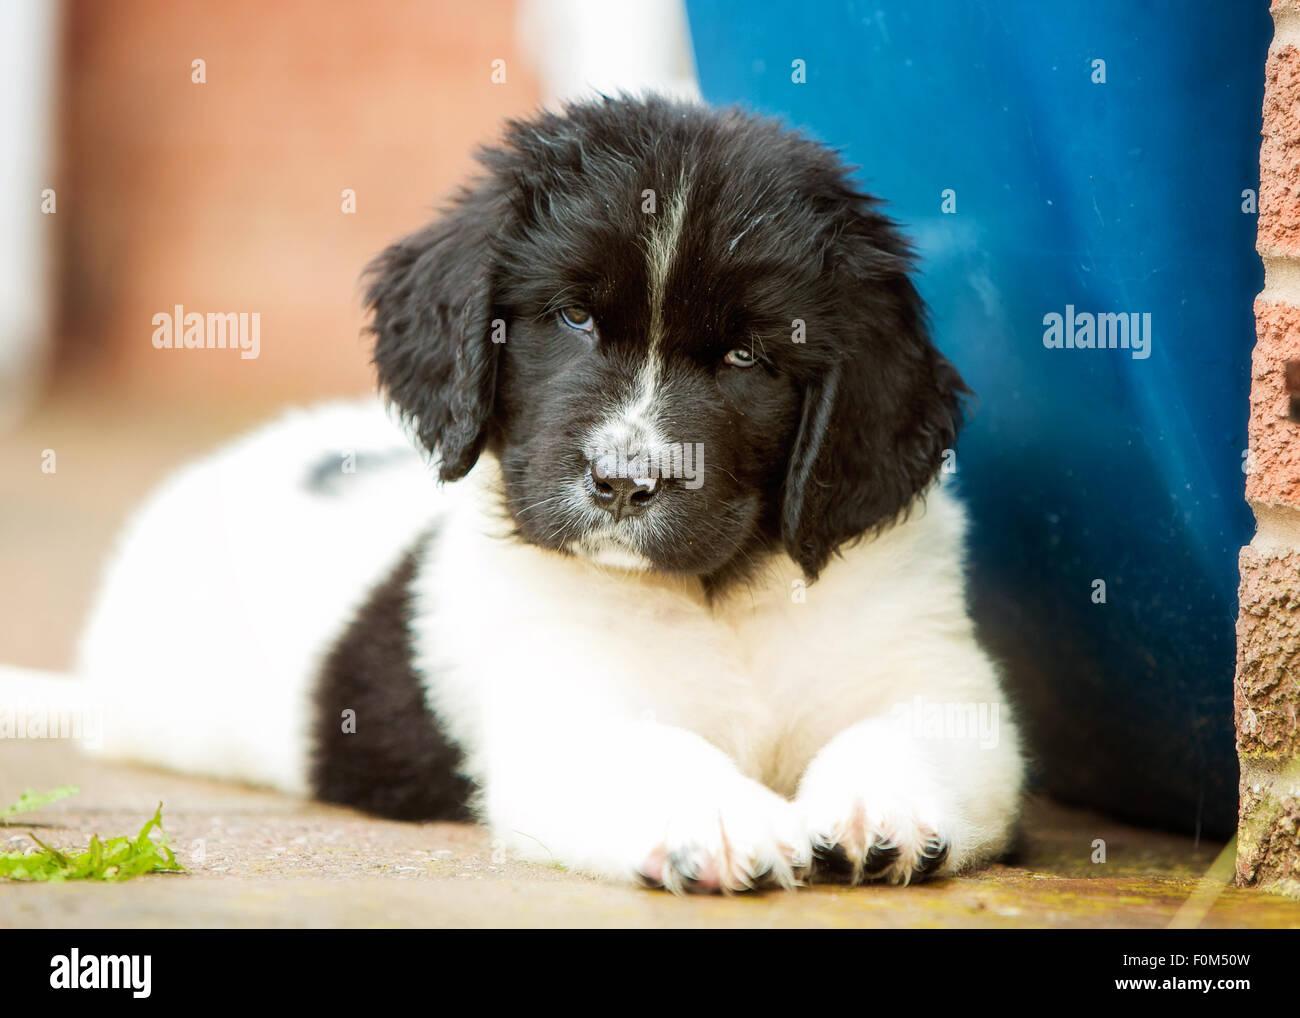 Landseer Newfoundland Puppy 8 Weeks Old Stock Photo 86494825 Alamy